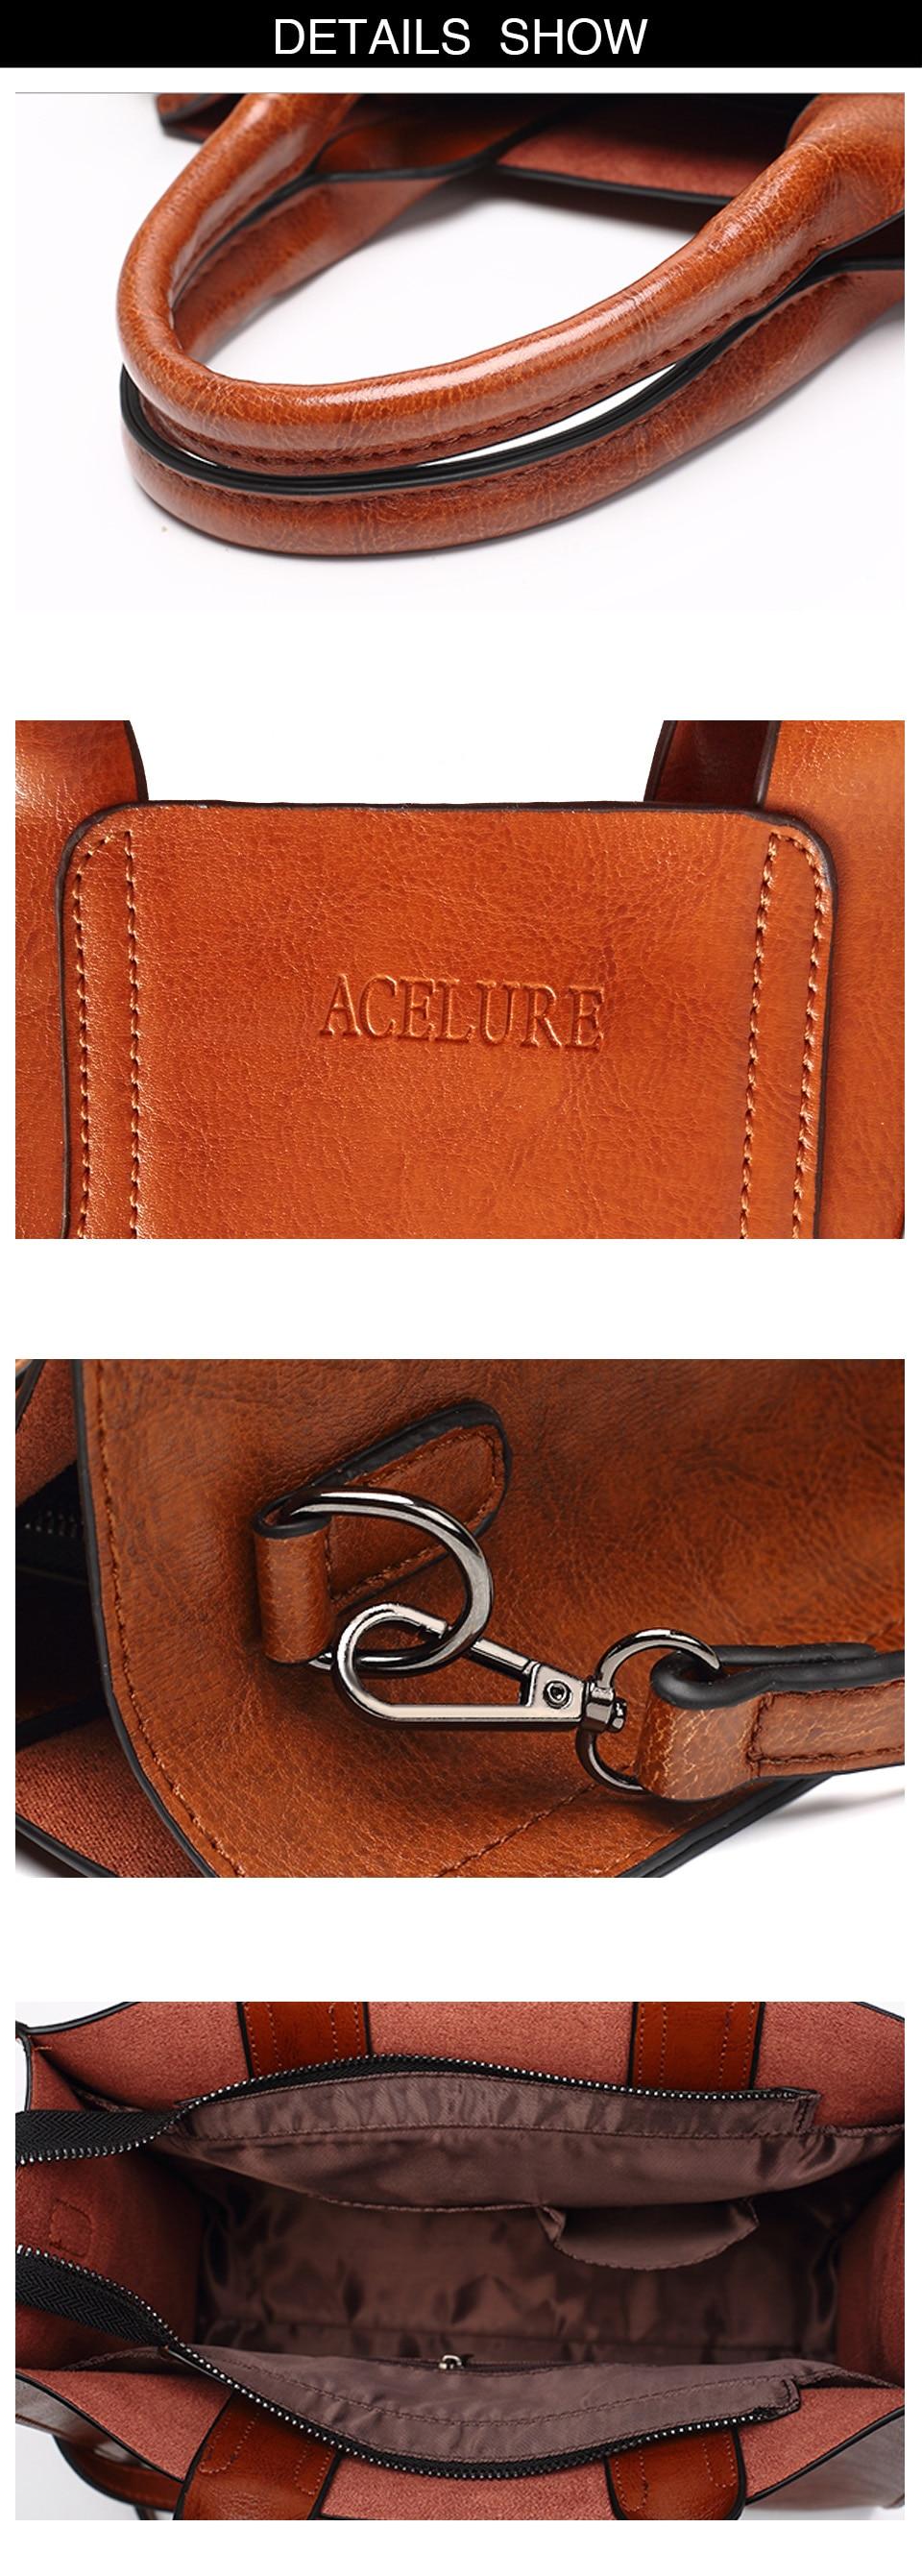 ACELURE Leather Handbags Big Women Bag High Quality Casual Female ... 90f2fd0a9abe0